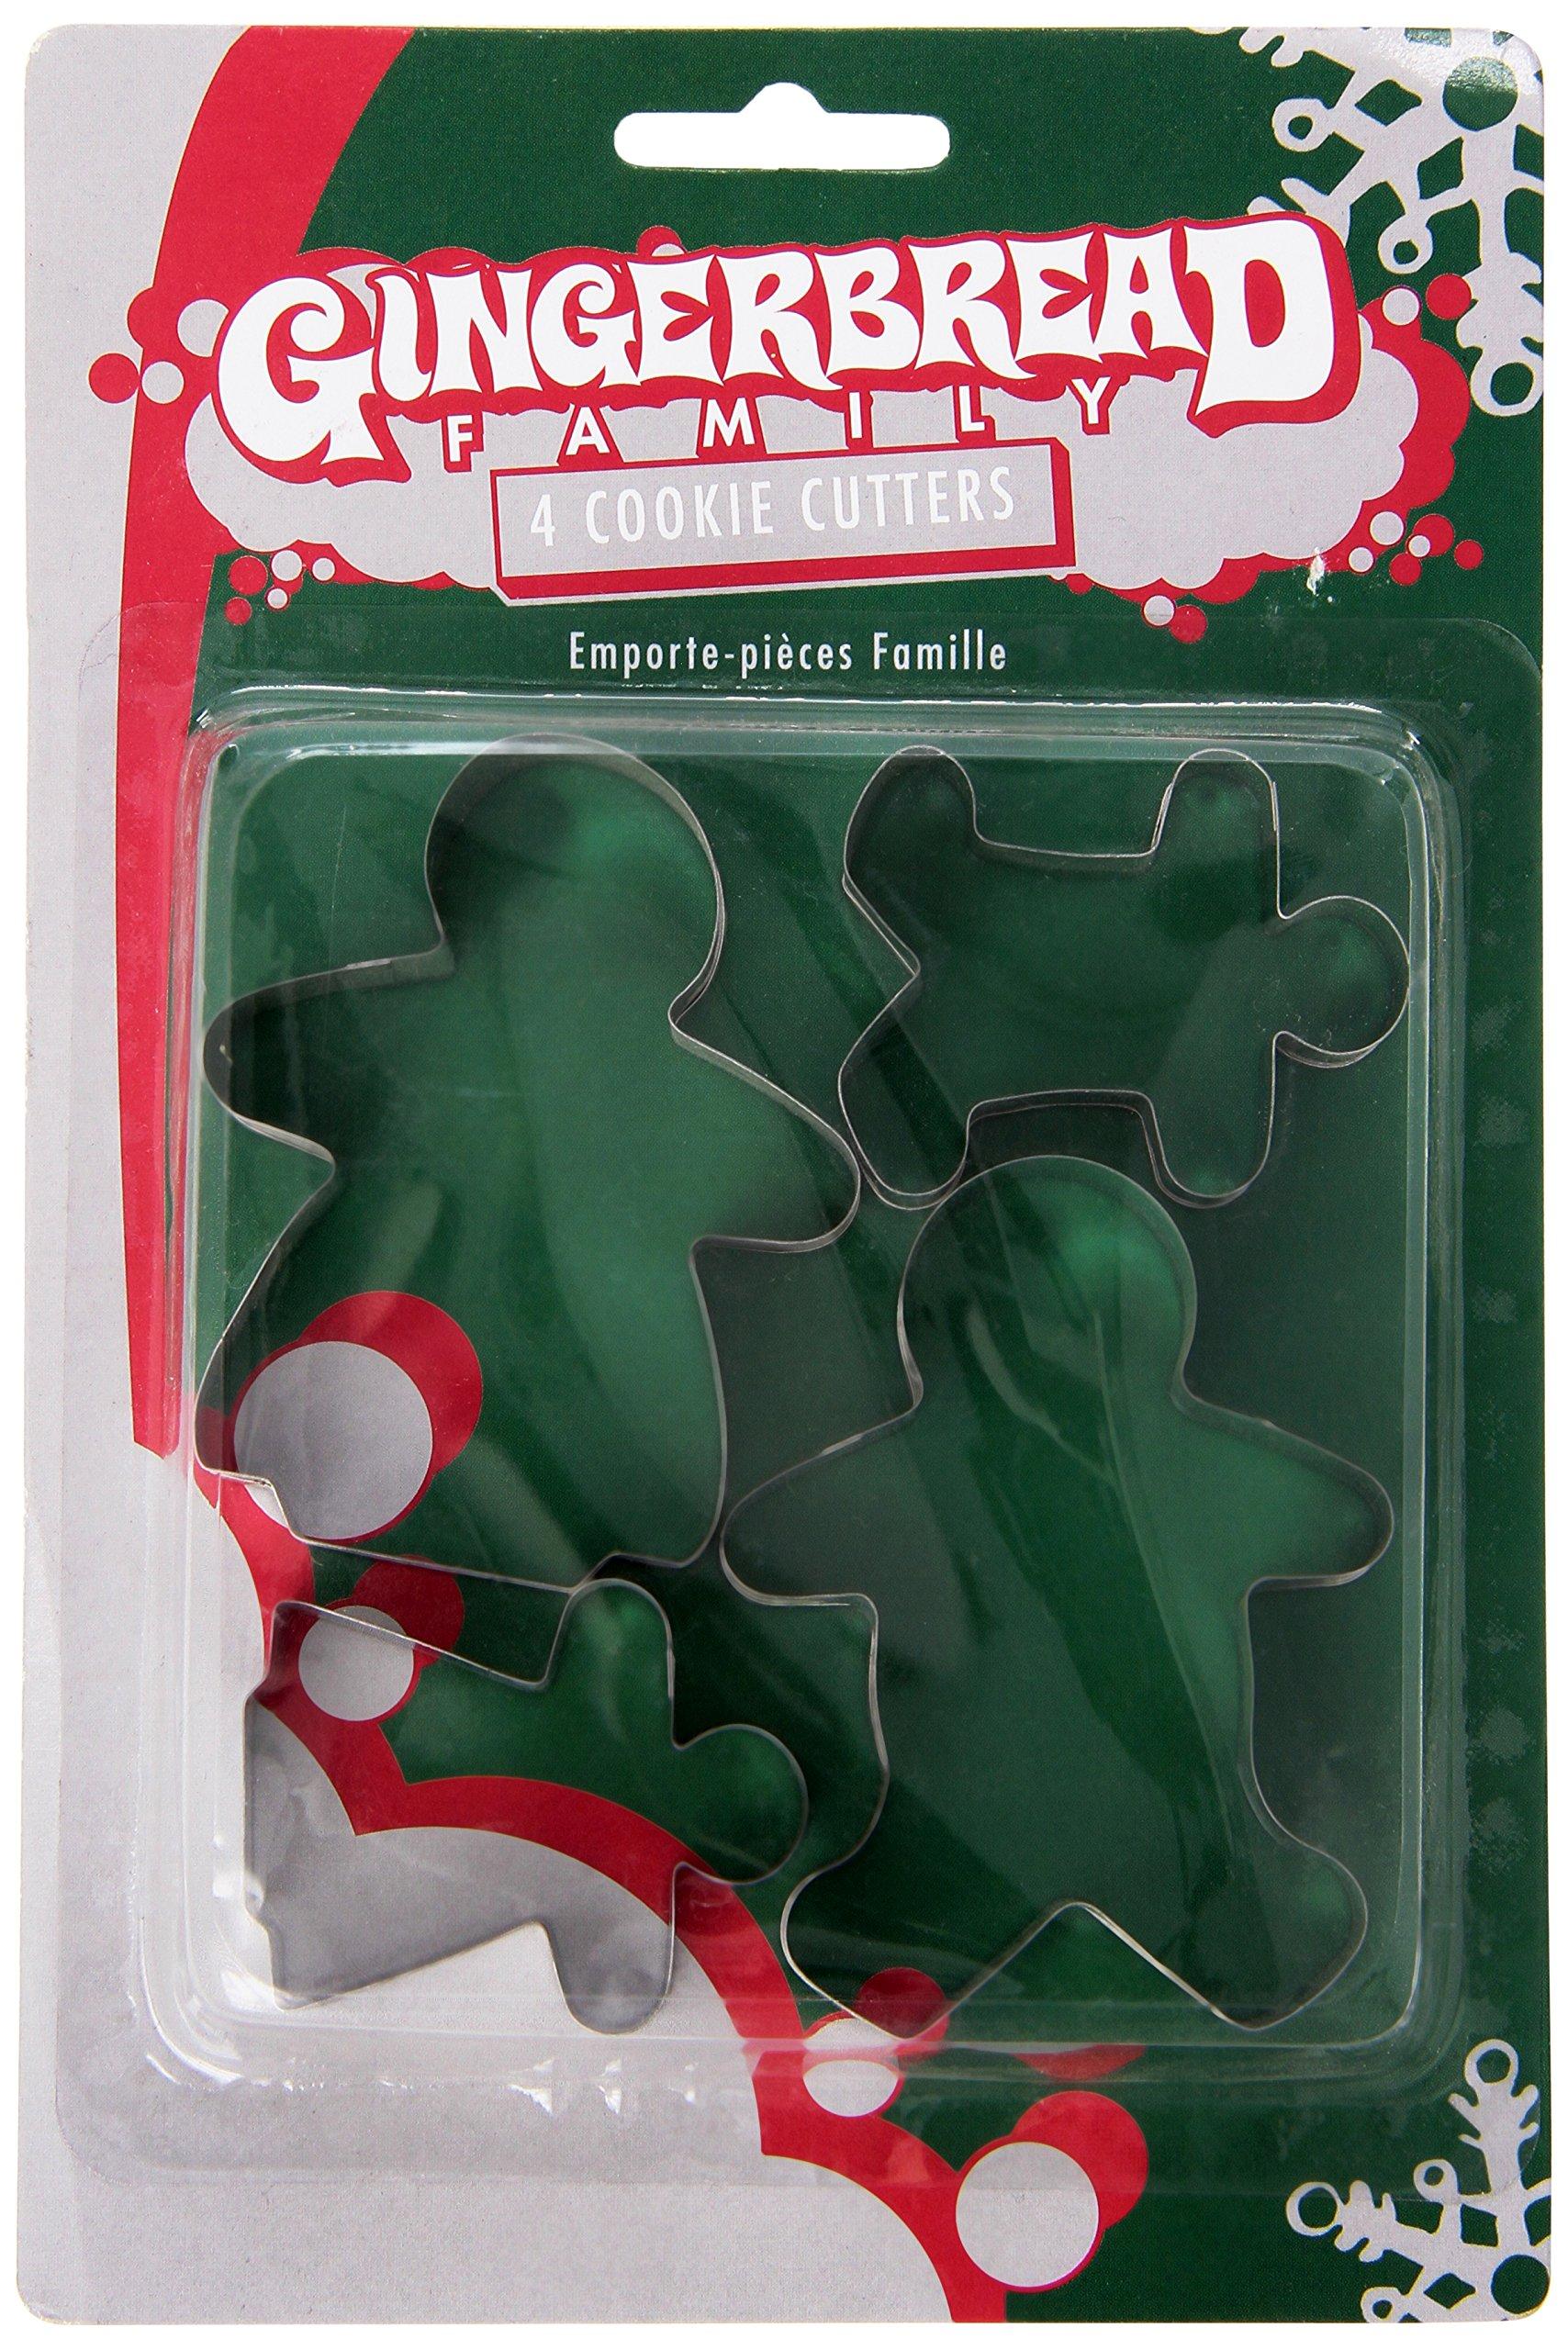 Fox Run 3553 Gingerbread Family Cookie cutters, 1.25 x 5.75 x 8.75 inches, Metallic